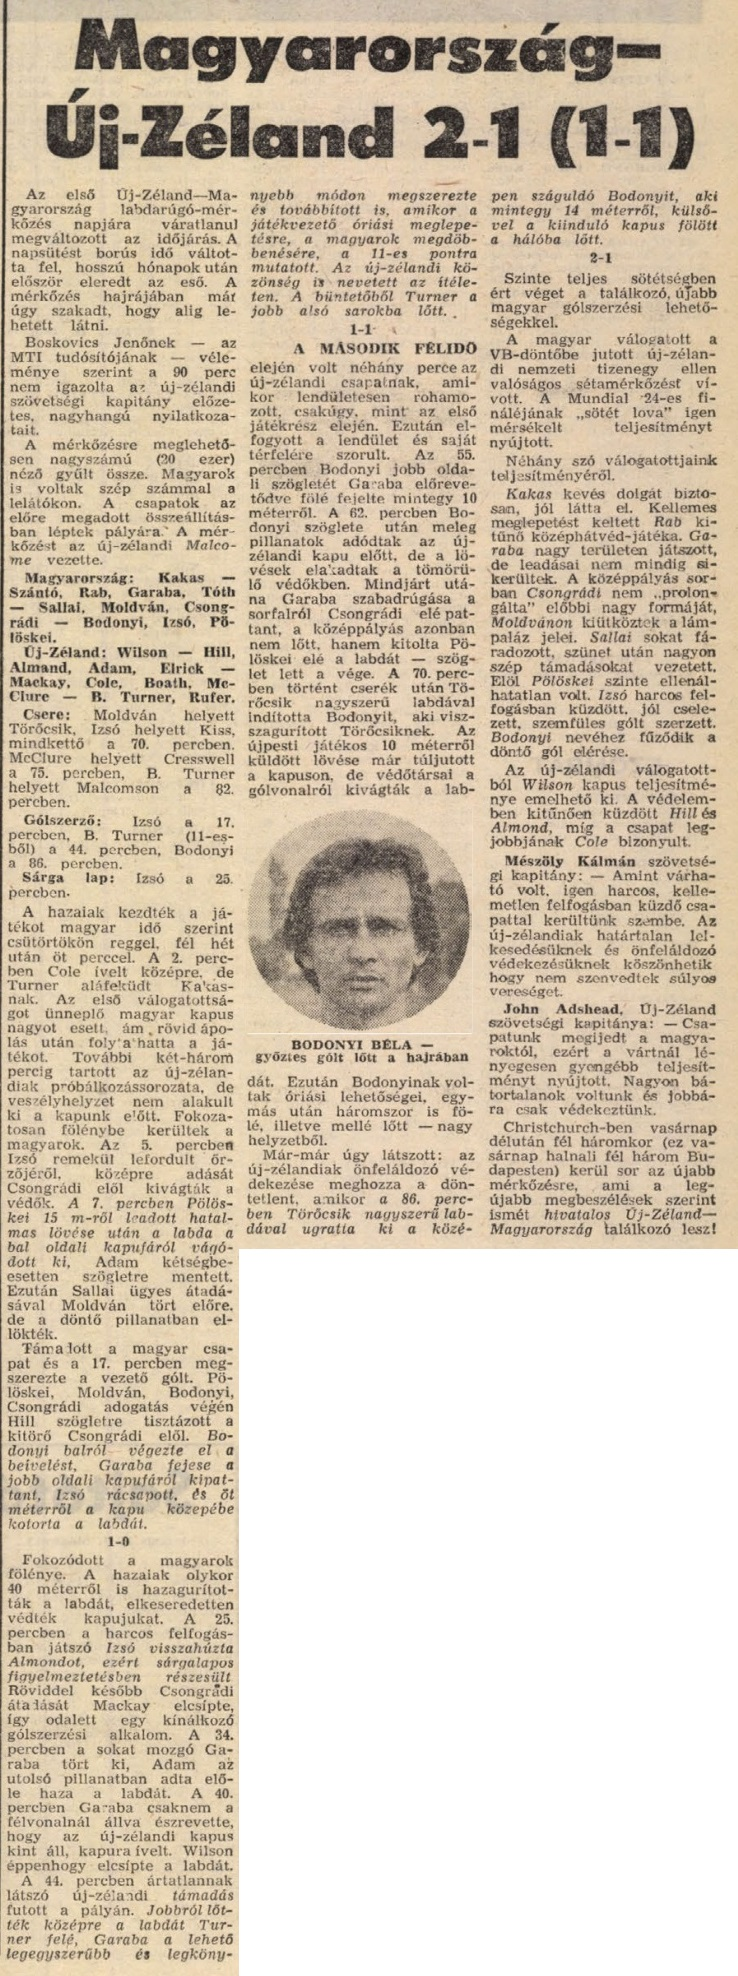 idokapszula_nb_i_1981_82_uj_zeland_magyarorszag_merkozesek_kulonkiadas_1.jpg